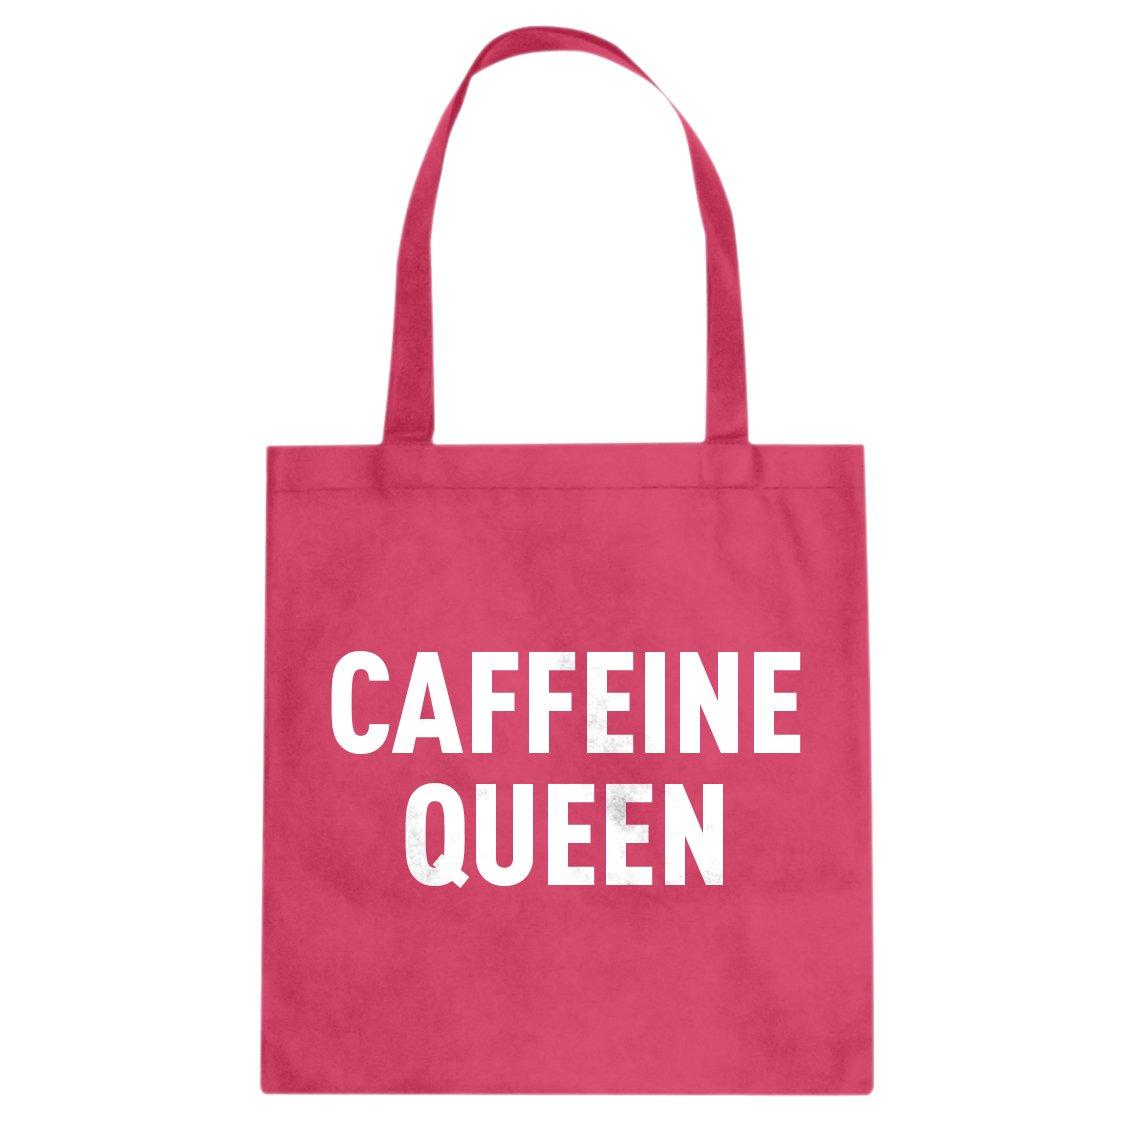 Indica Plateau Caffeine Queenキャンバストートバッグ B074HJ92R9 ピンク L